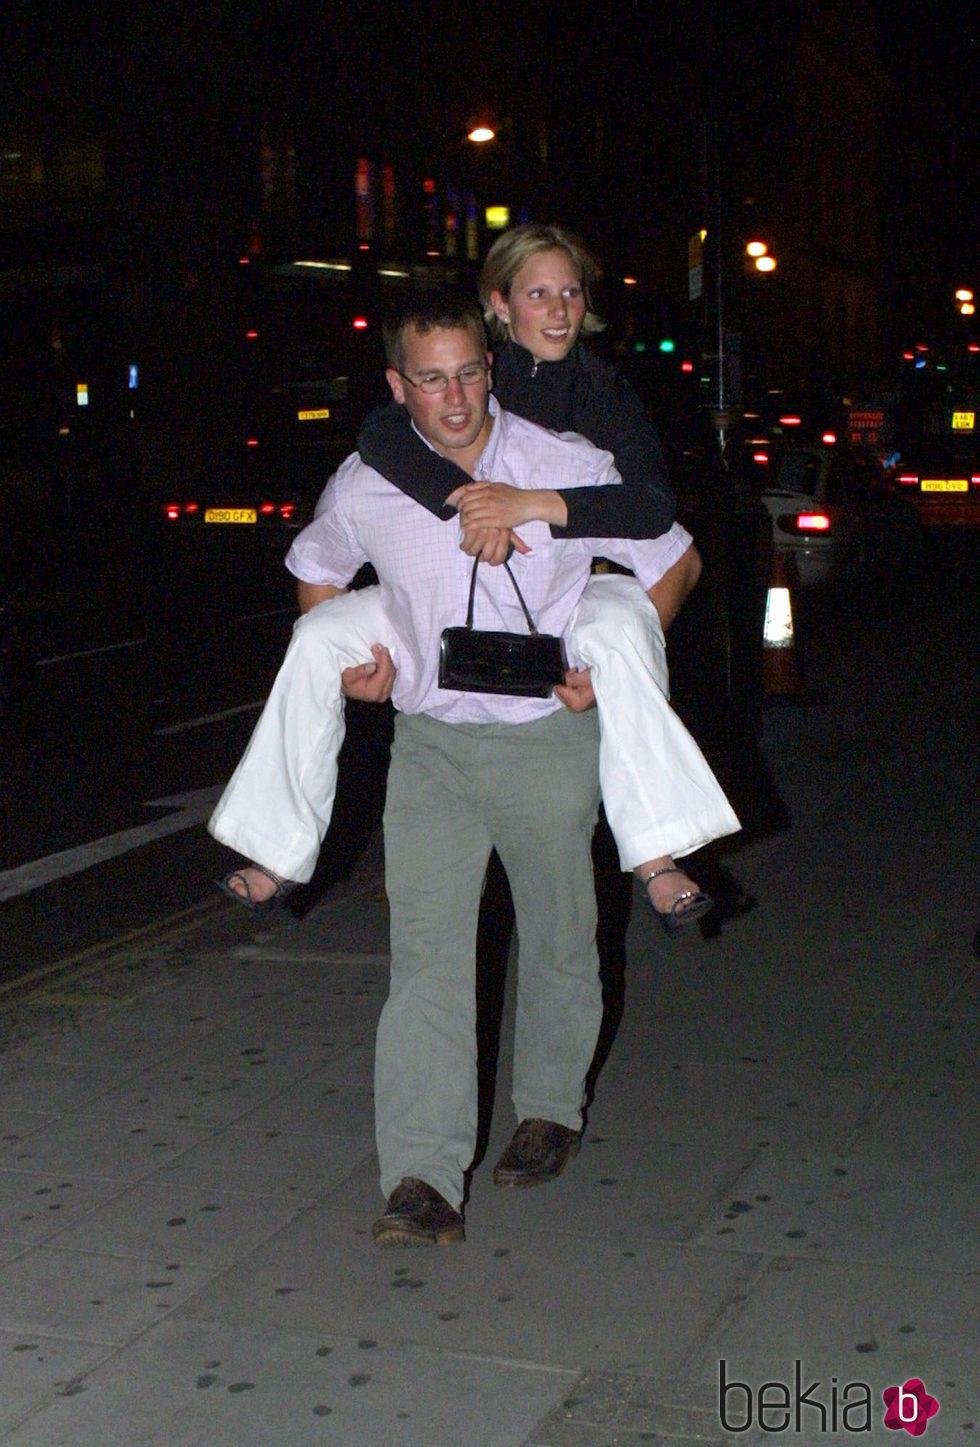 Peter Phillips lleva a su hermana Zara Phillips a caballito